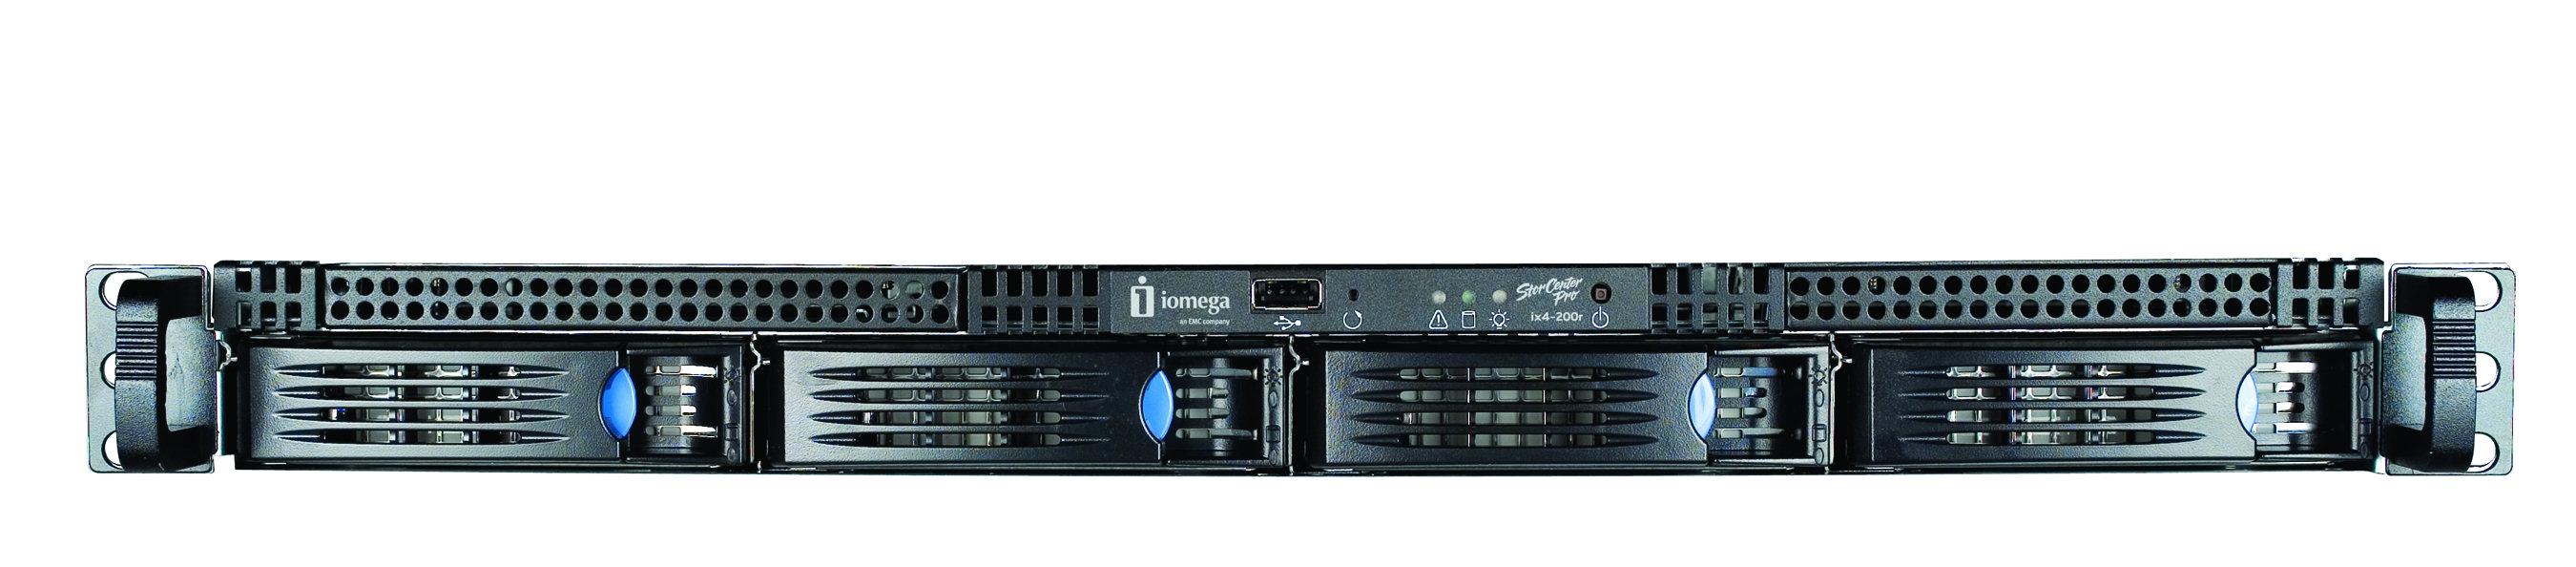 Iomega ix4 200r